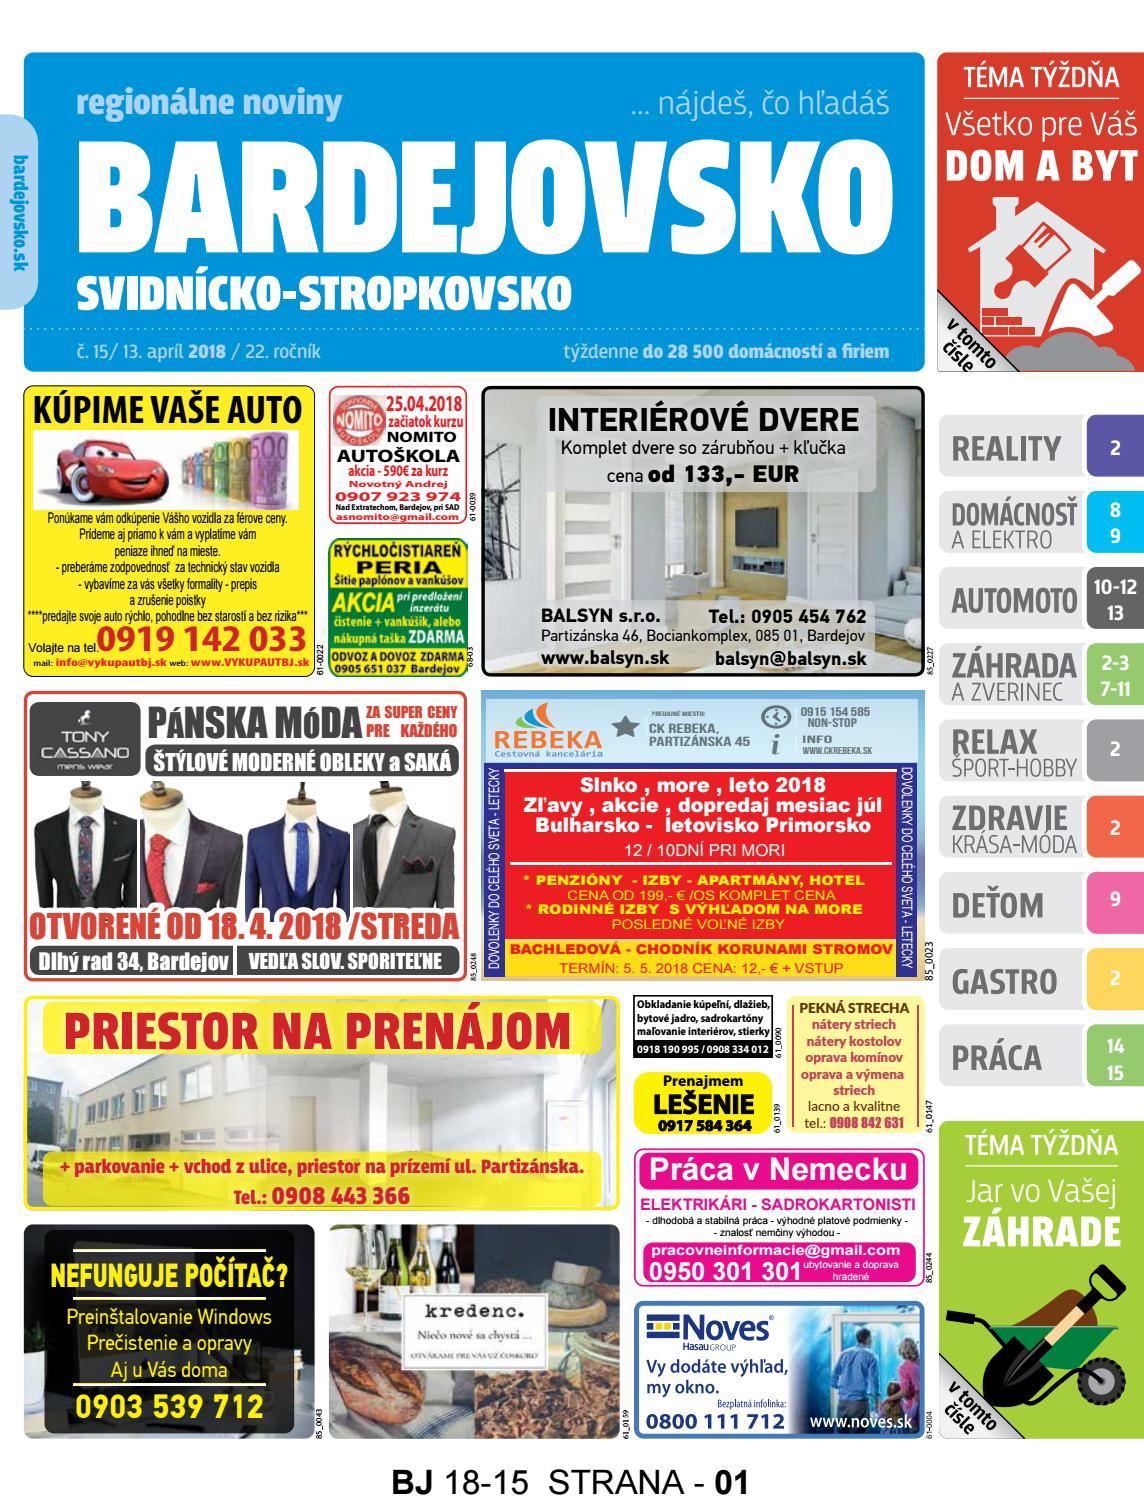 zadarmo České datovania webové stránky